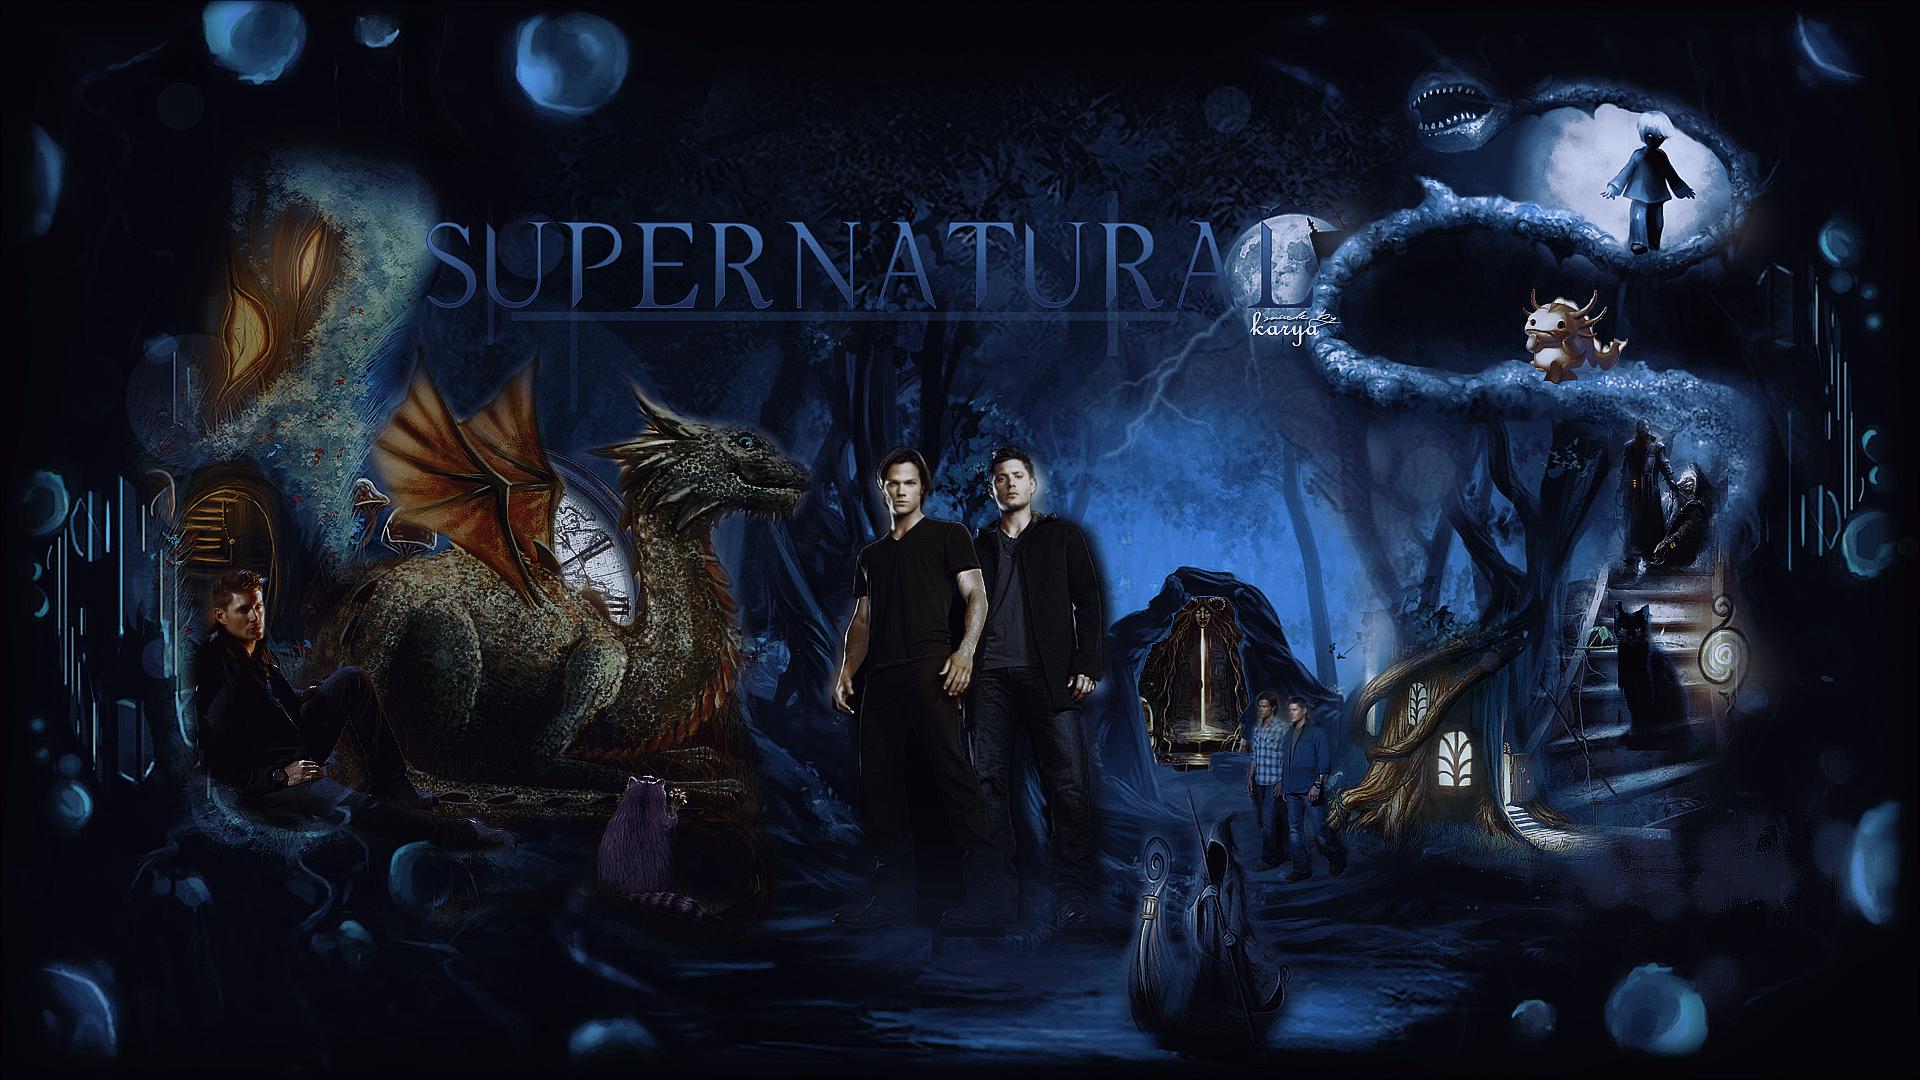 Supernatural season 9 wallpaper wallpapersafari supernatural wallpaper livejournal justromanova photo 1920x1080 voltagebd Gallery